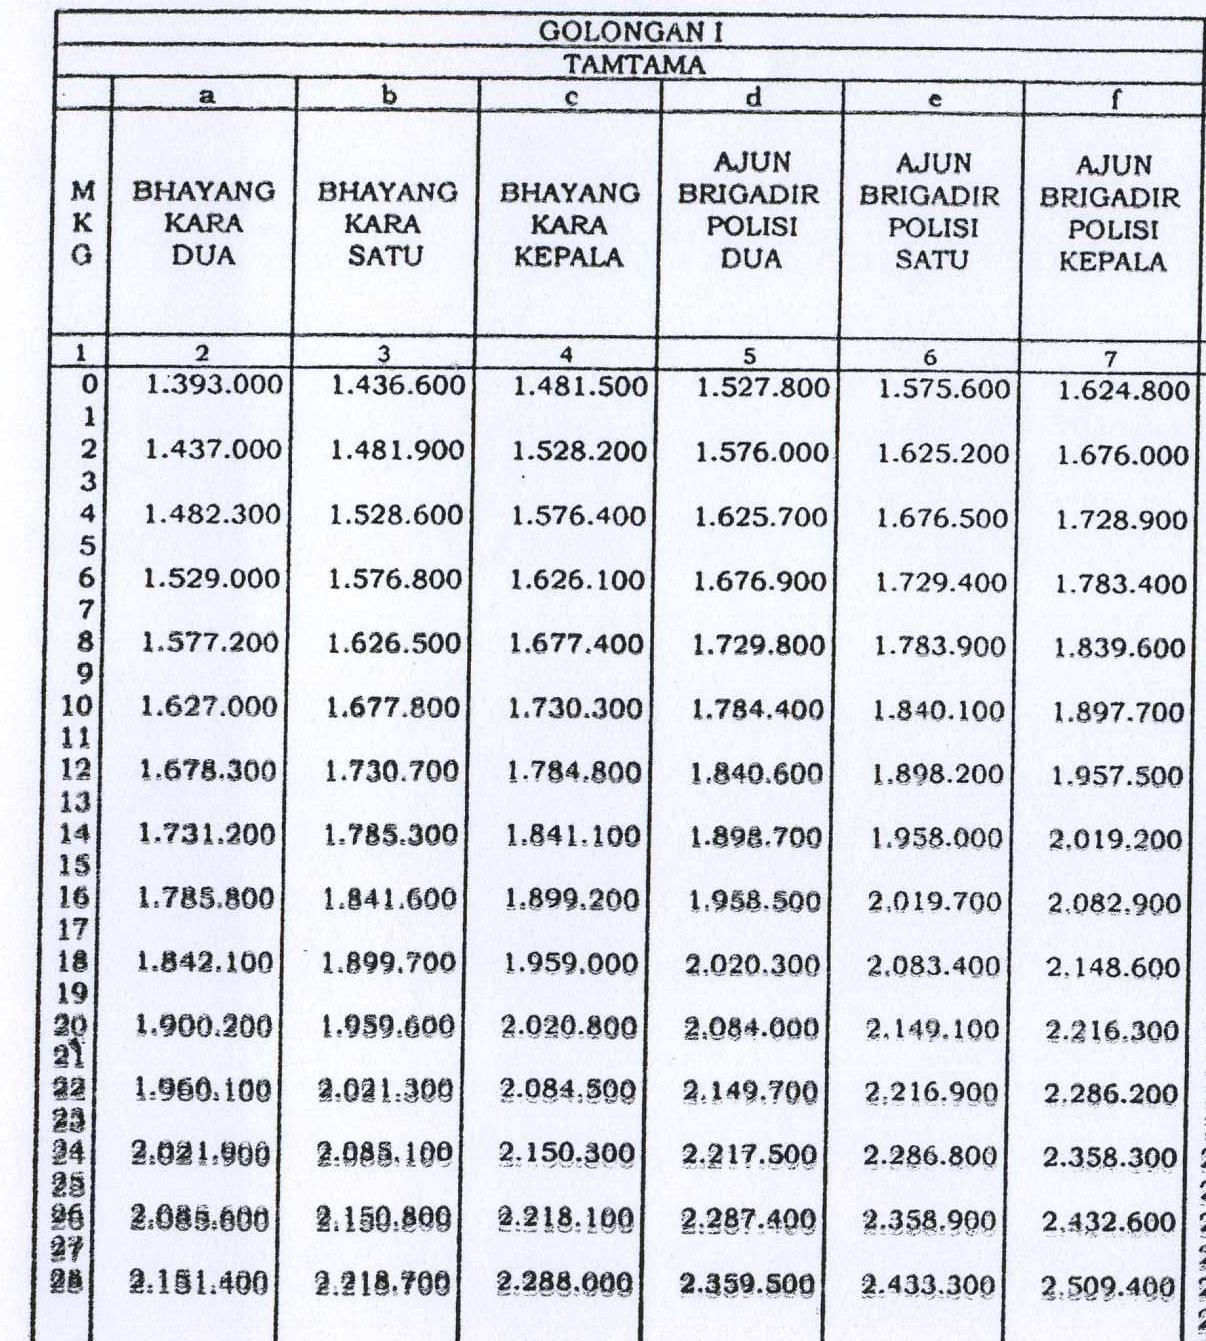 Tabel Gaji Pokok Tahun 2013